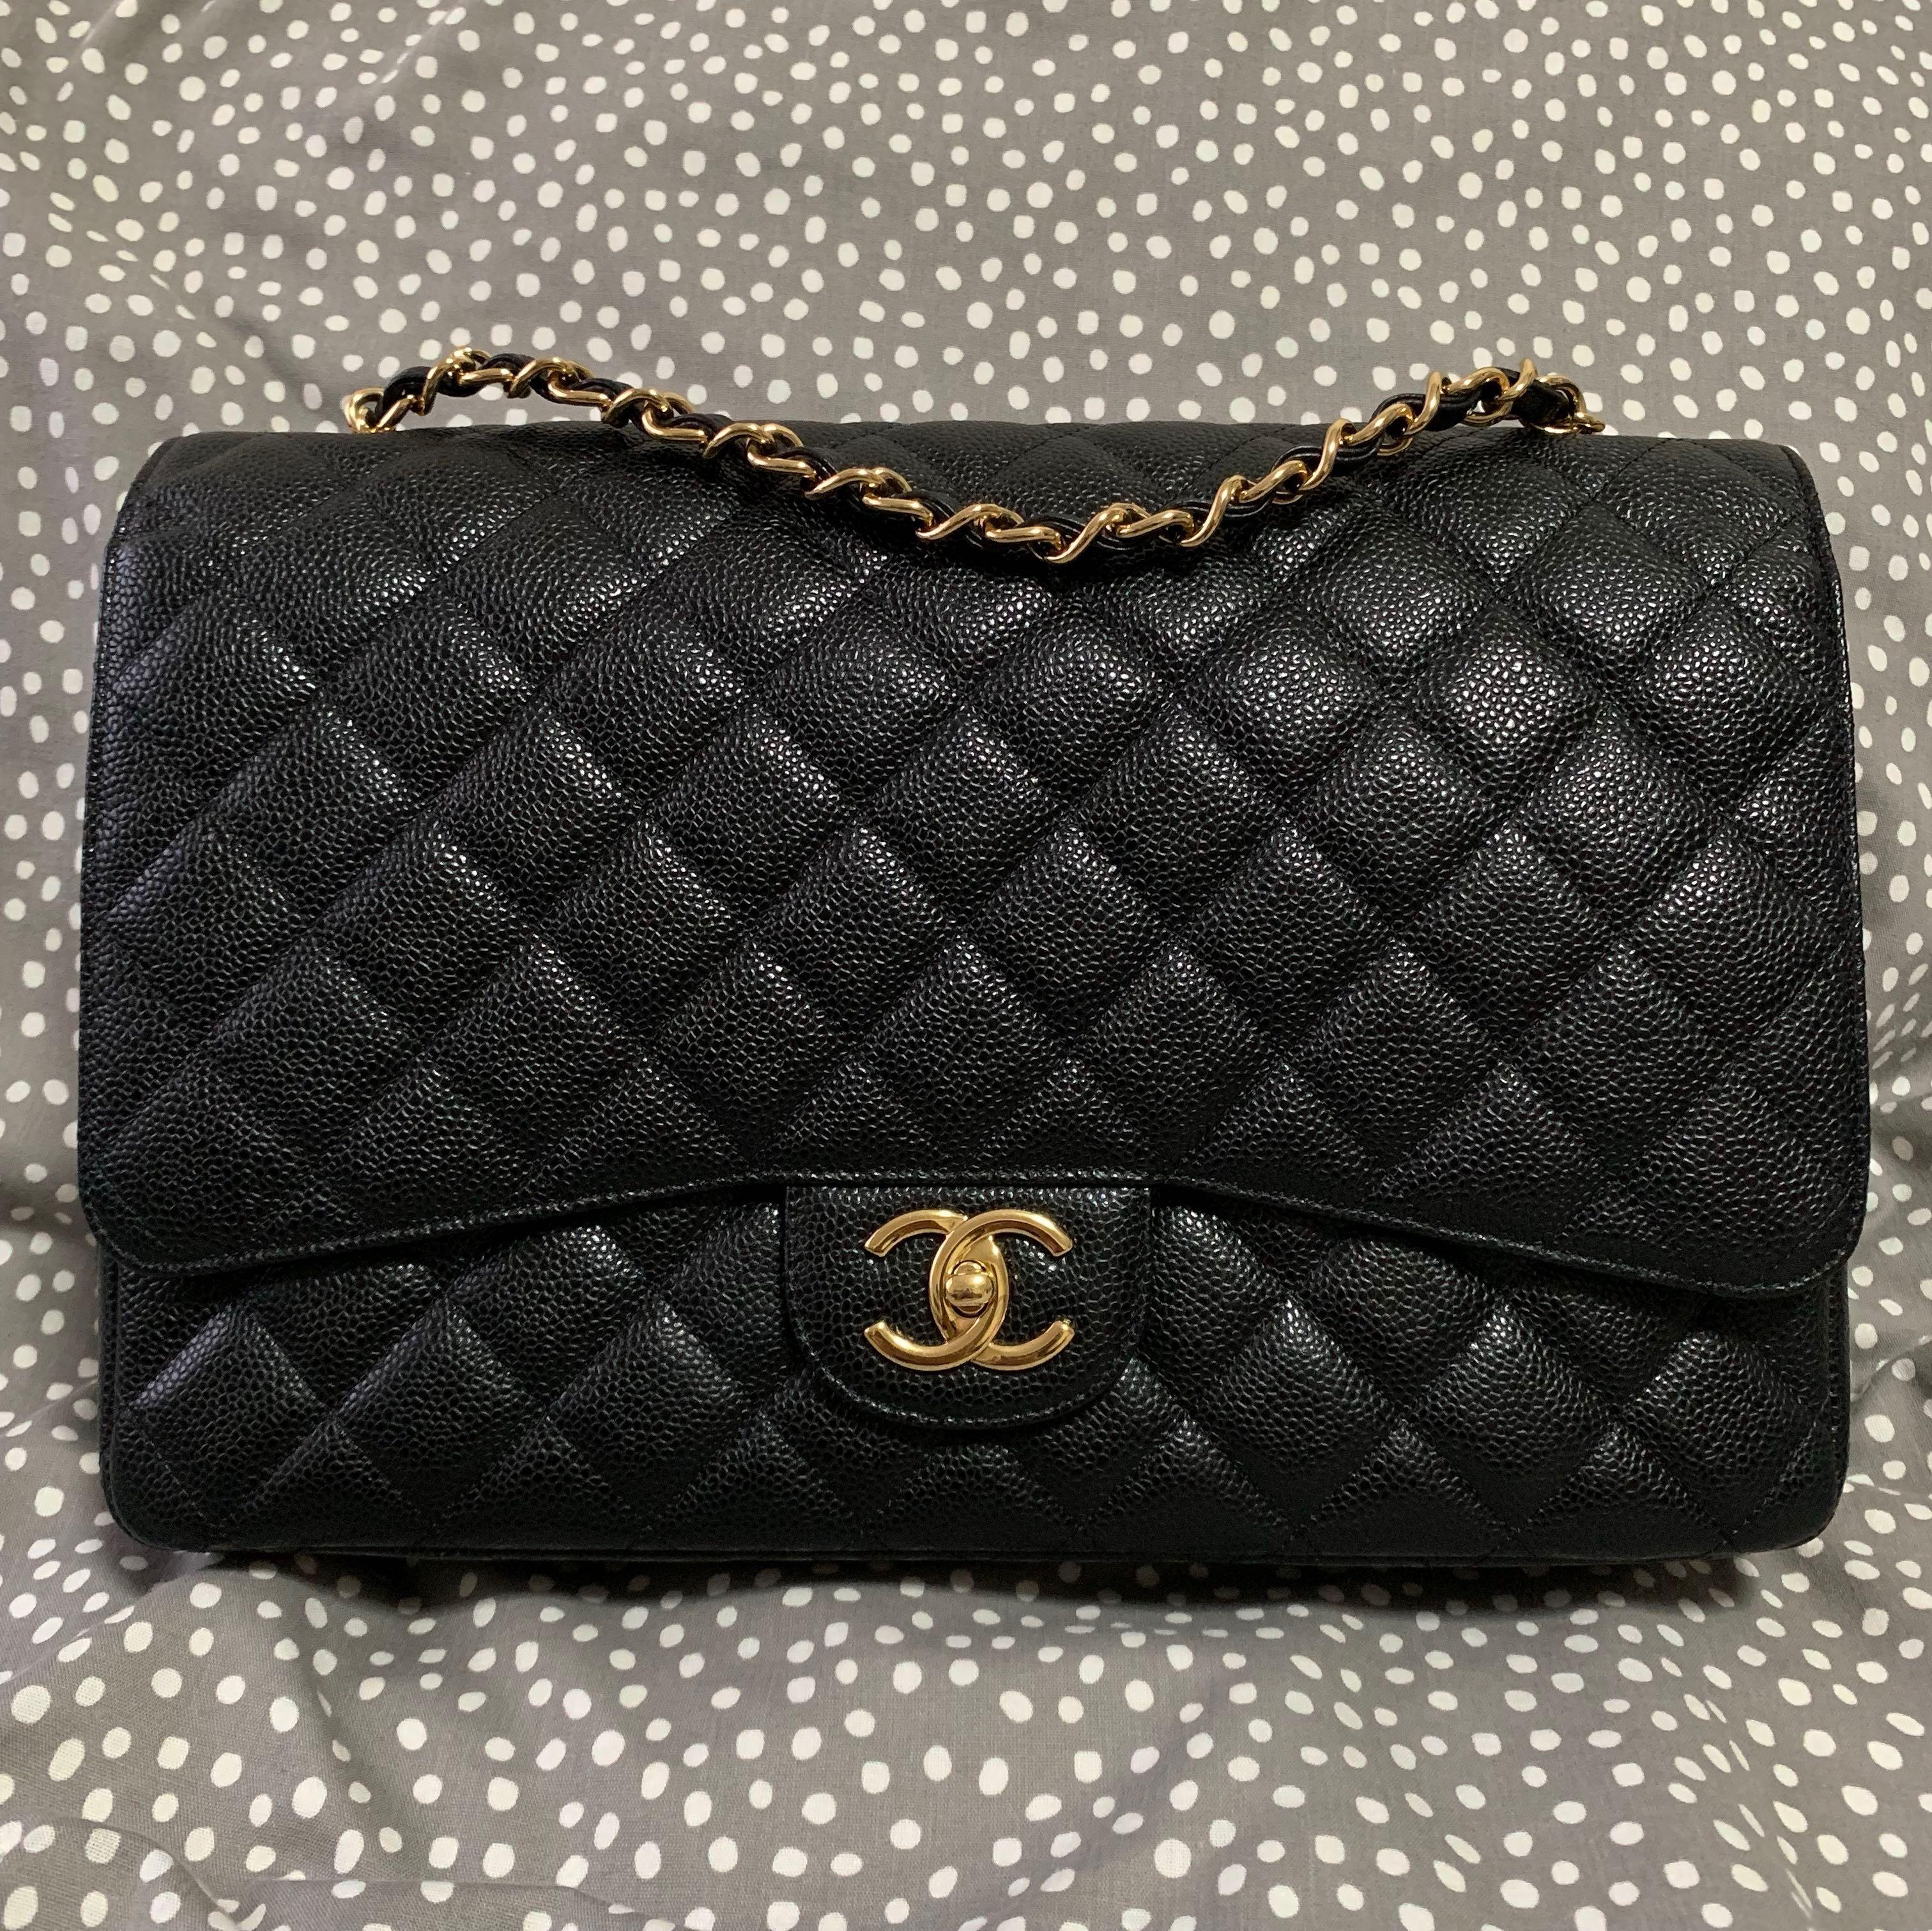 69085123b 🛑REDUCED🛑LN Chanel Maxi Classic Bag in Black Caviar & GHW Double ...